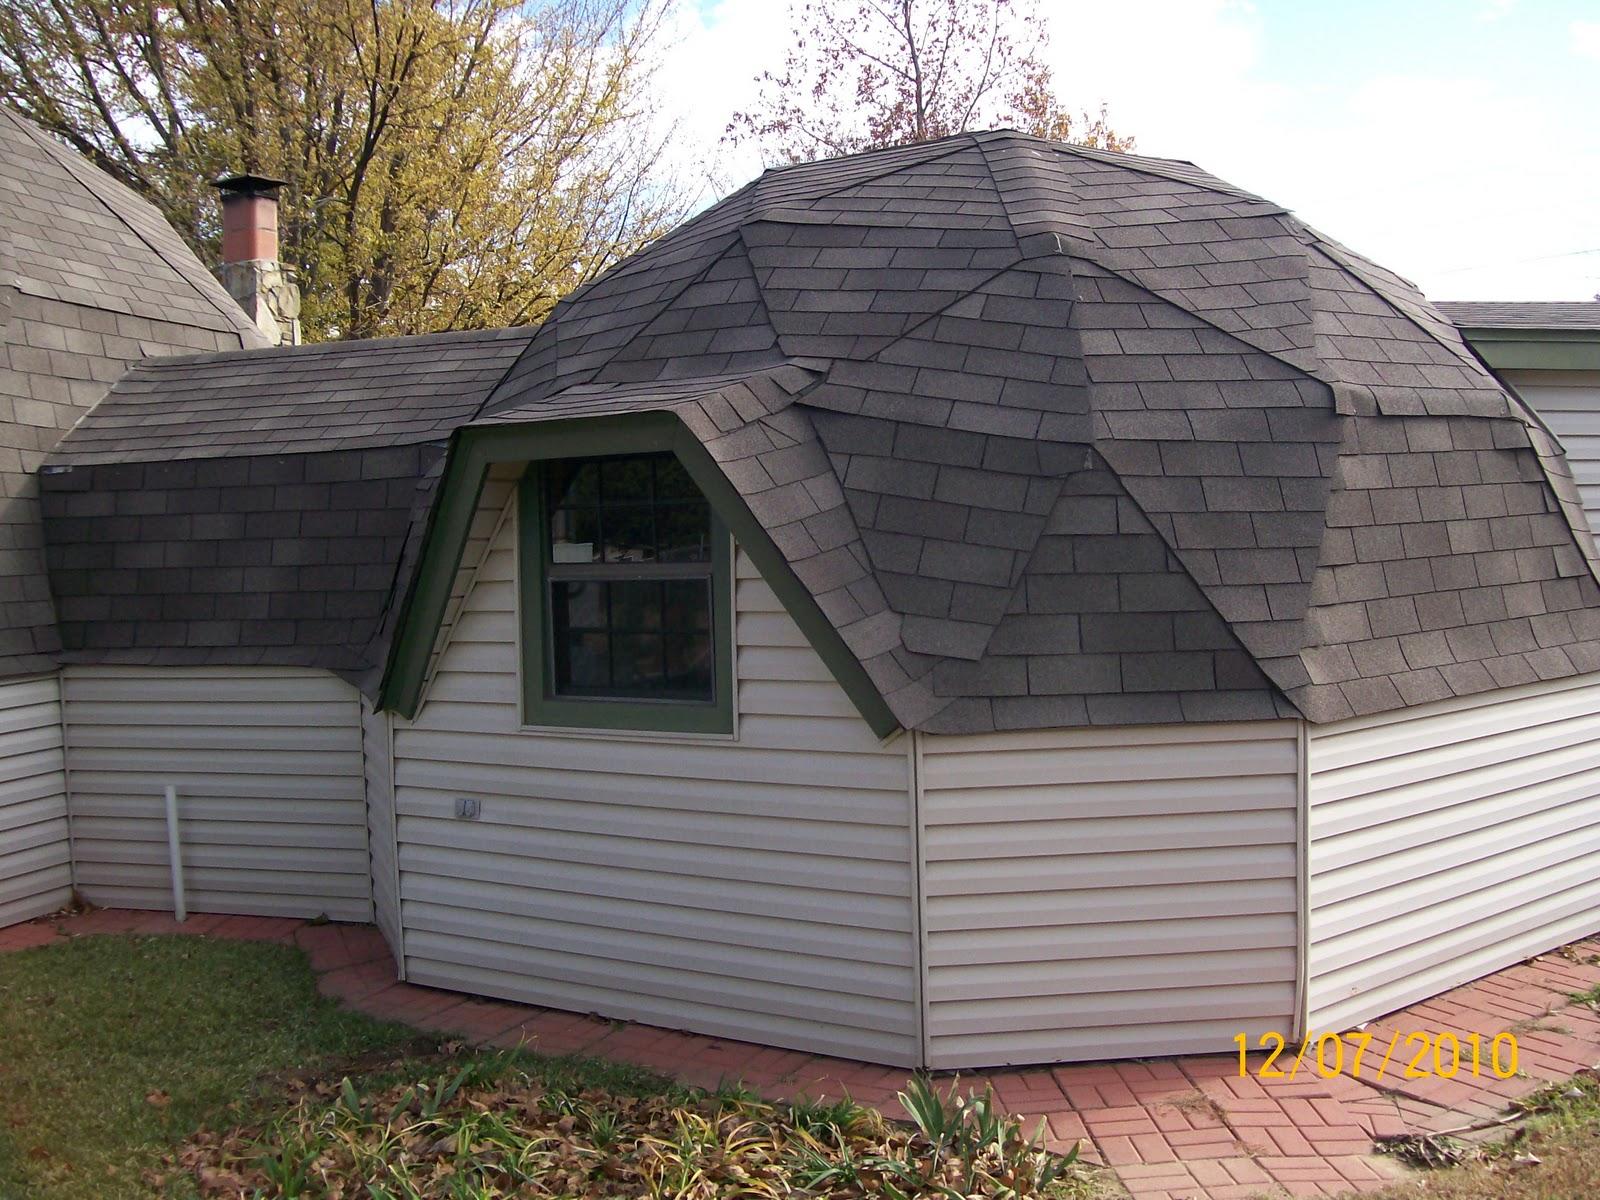 Metal Dome Garage : Dome garage